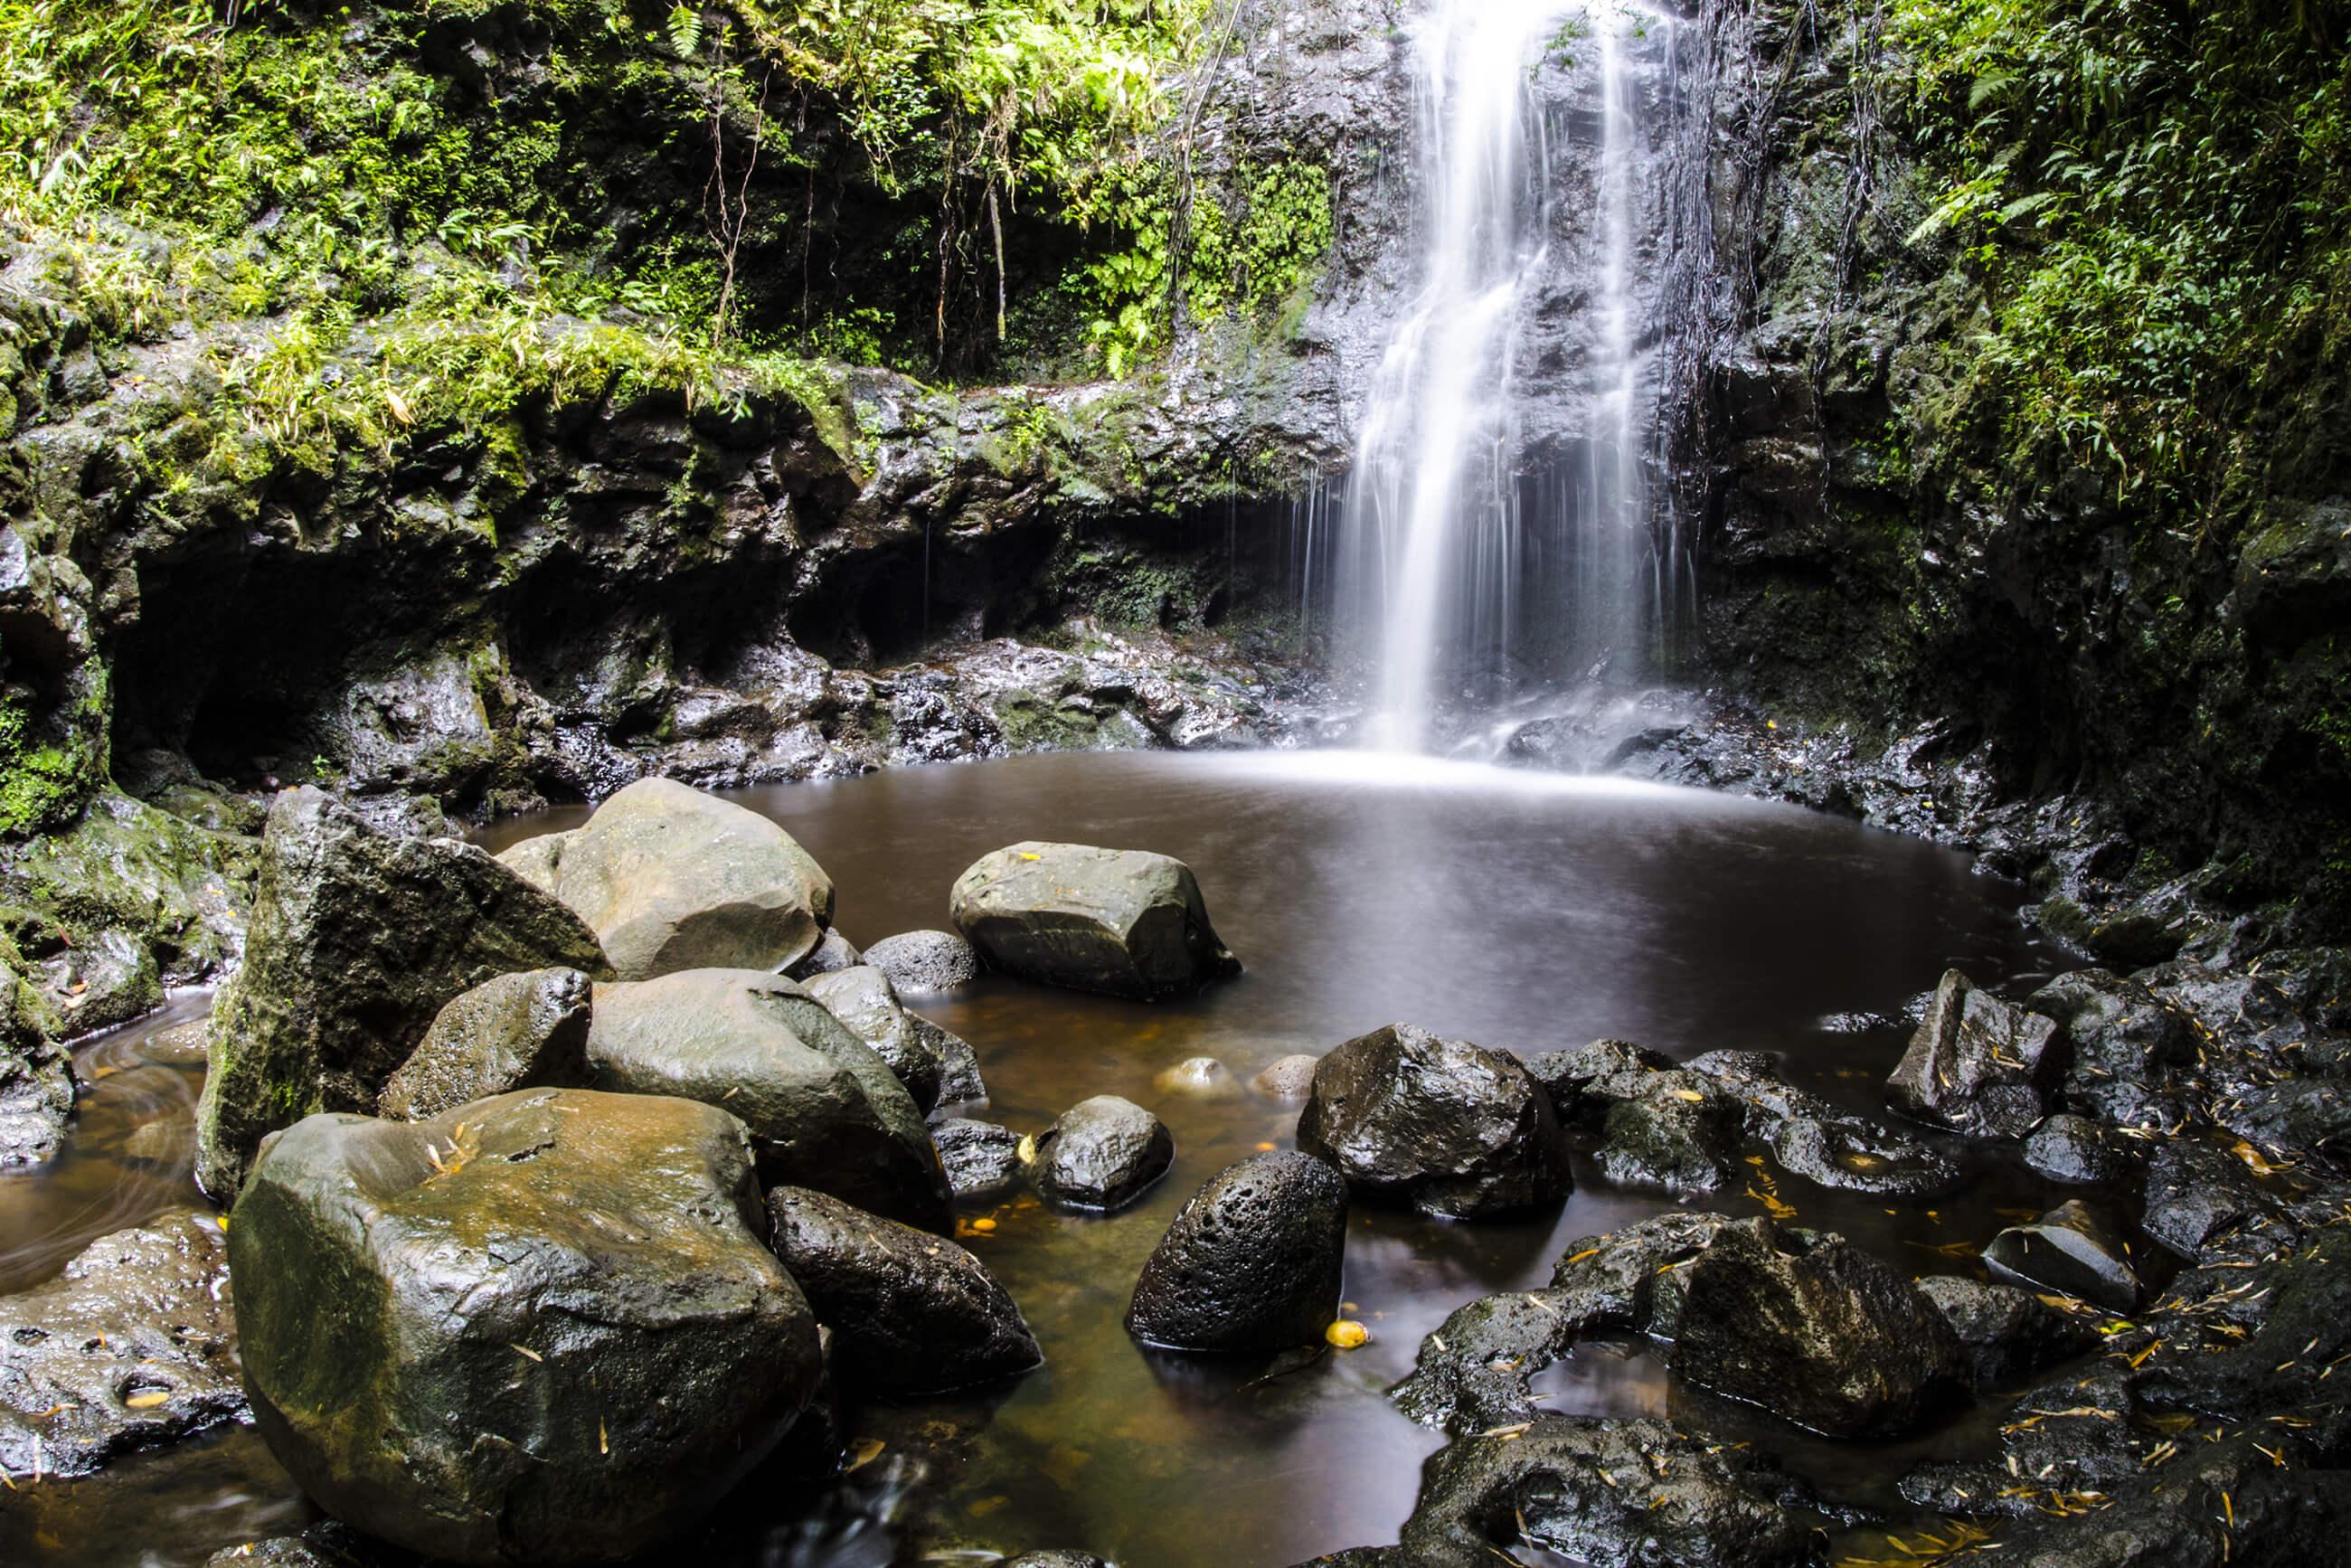 https://bubo.sk/uploads/galleries/16052/waterfall-3652346-1-1-.jpg